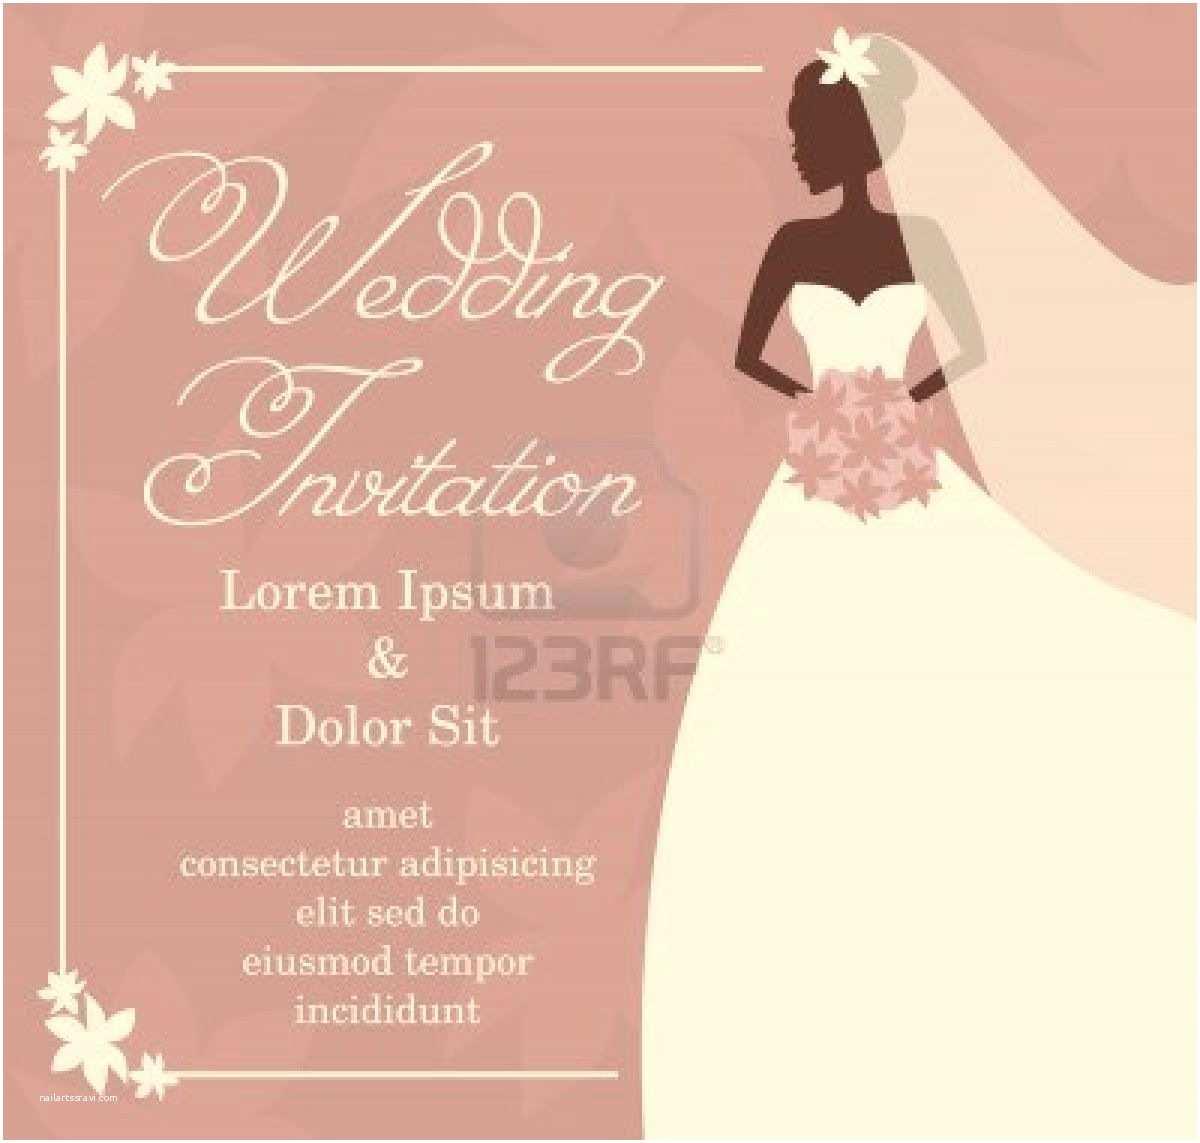 Customizable Wedding Invitations Free Wedding Invitation Samples